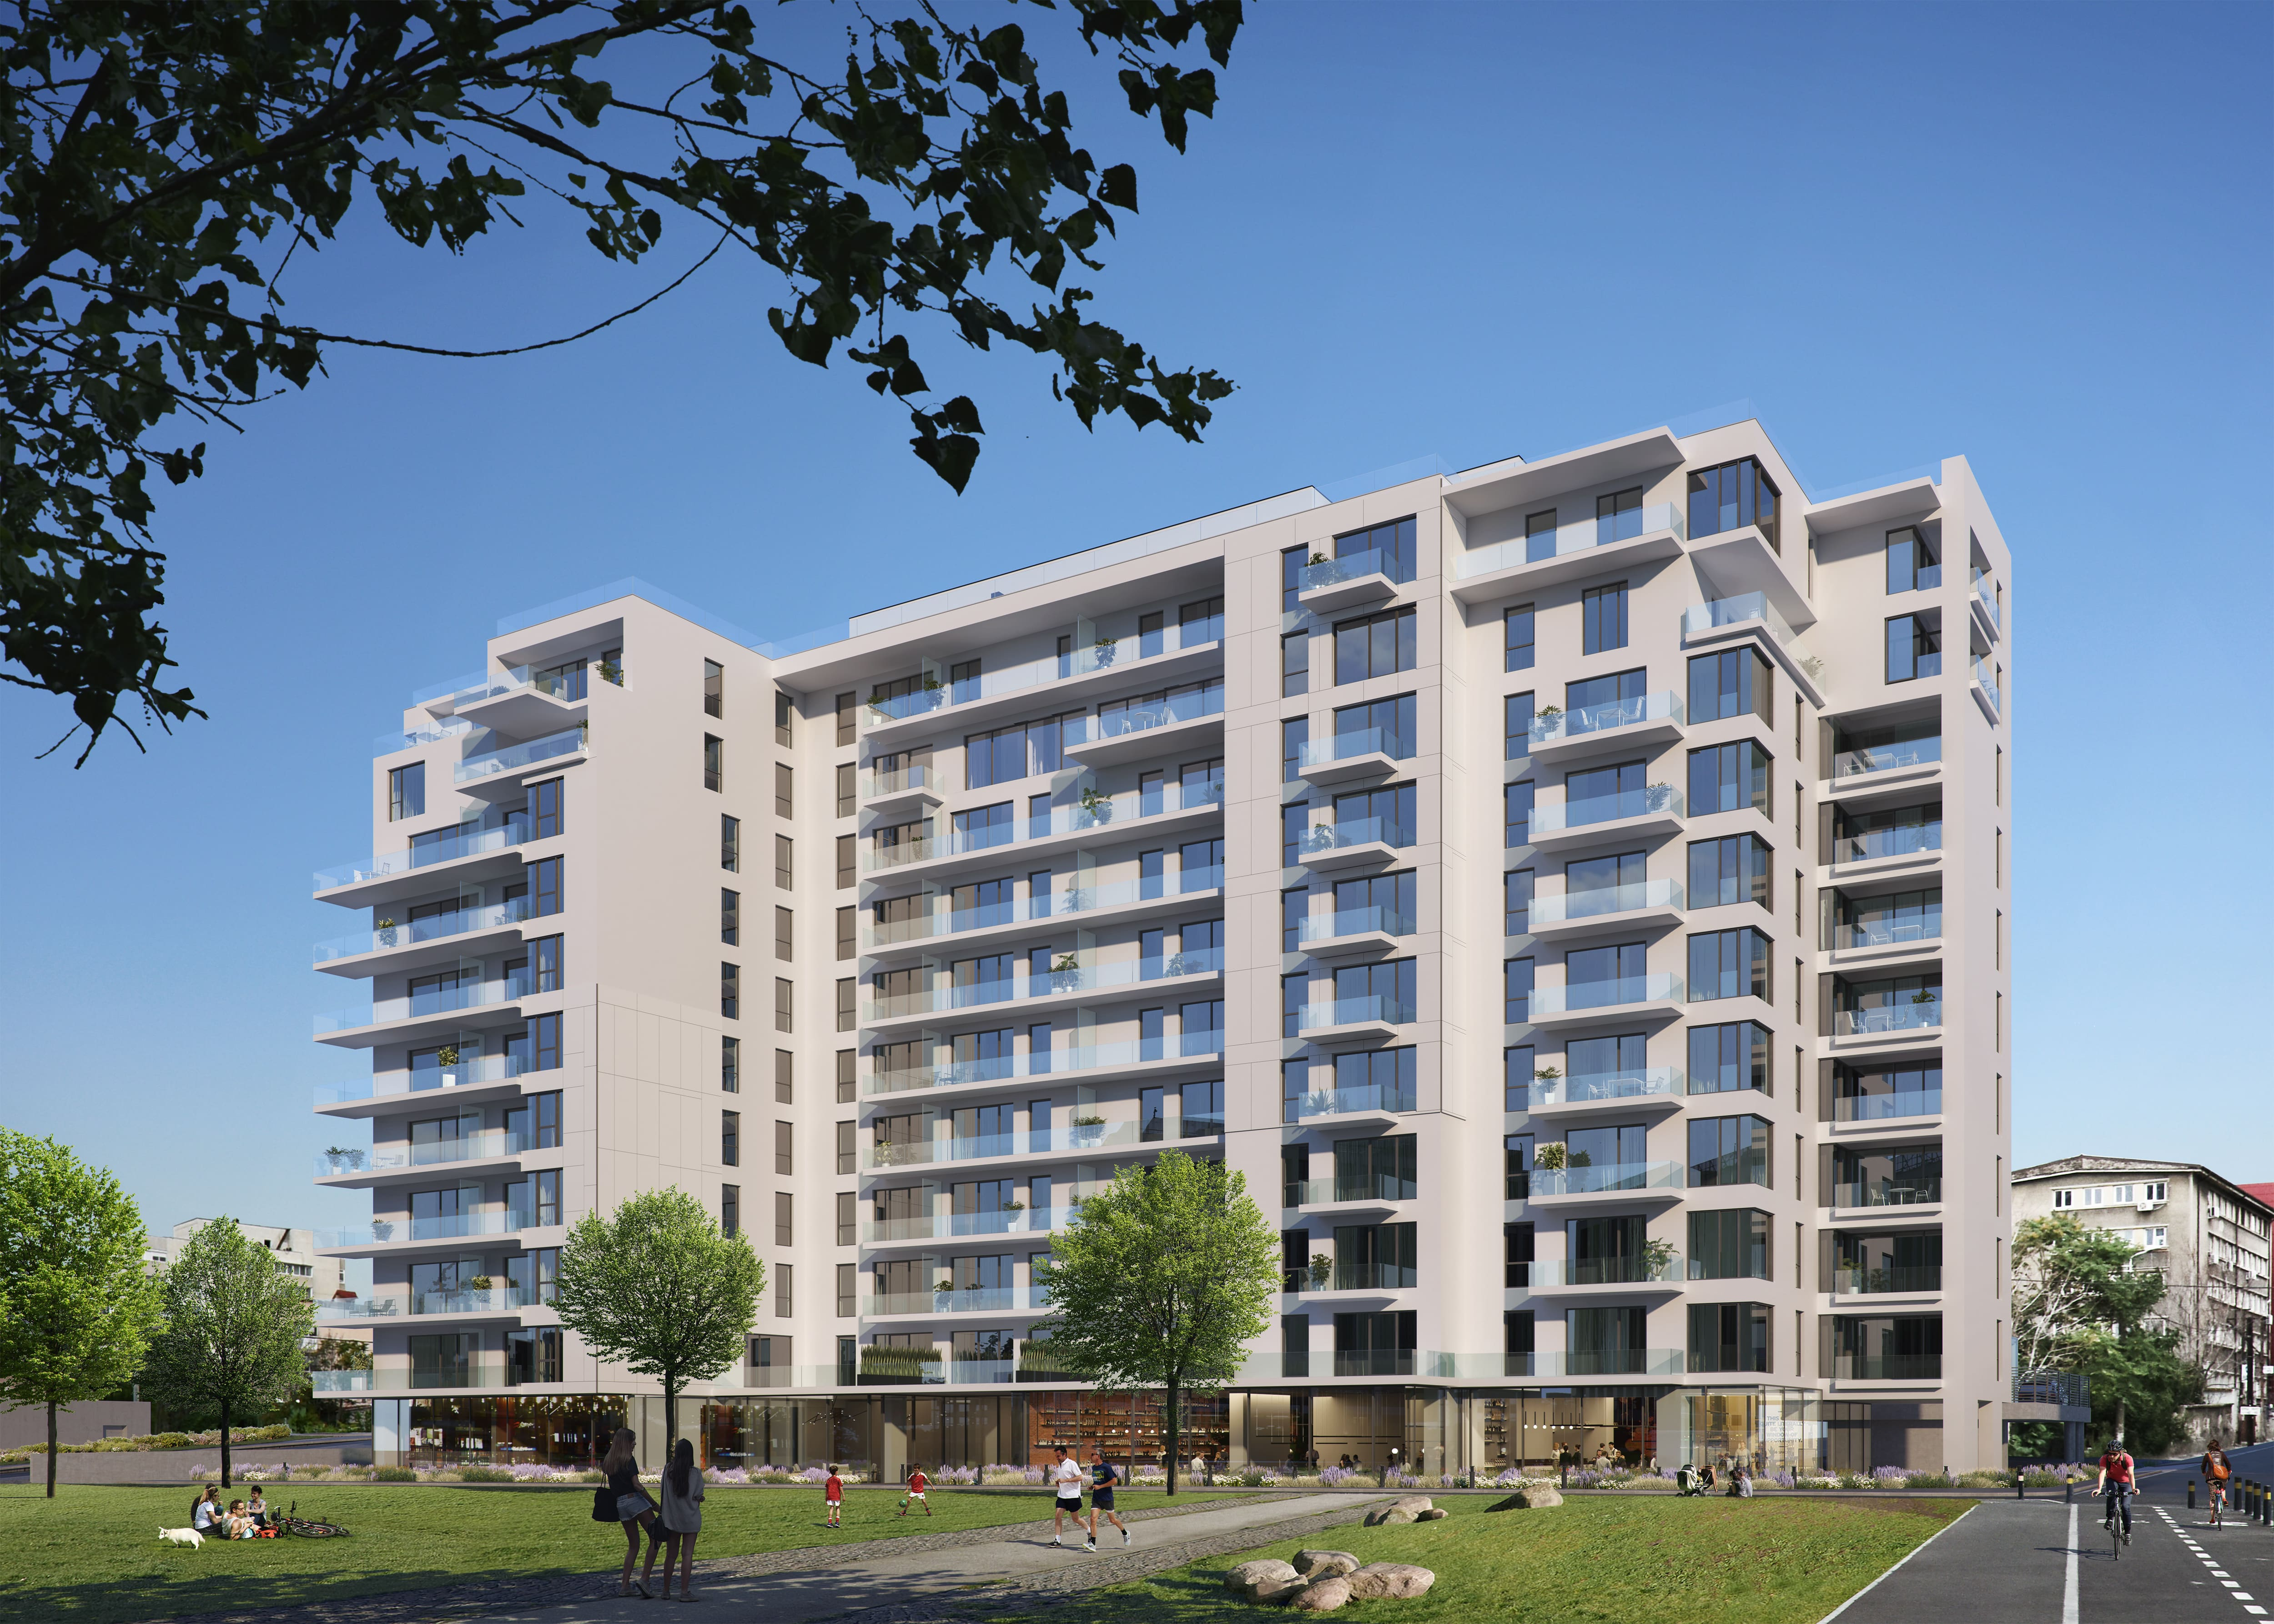 https://ahe-ro.s3.amazonaws.com/10817/penthouse-si-apartamente-unirii-%287%29.jpg